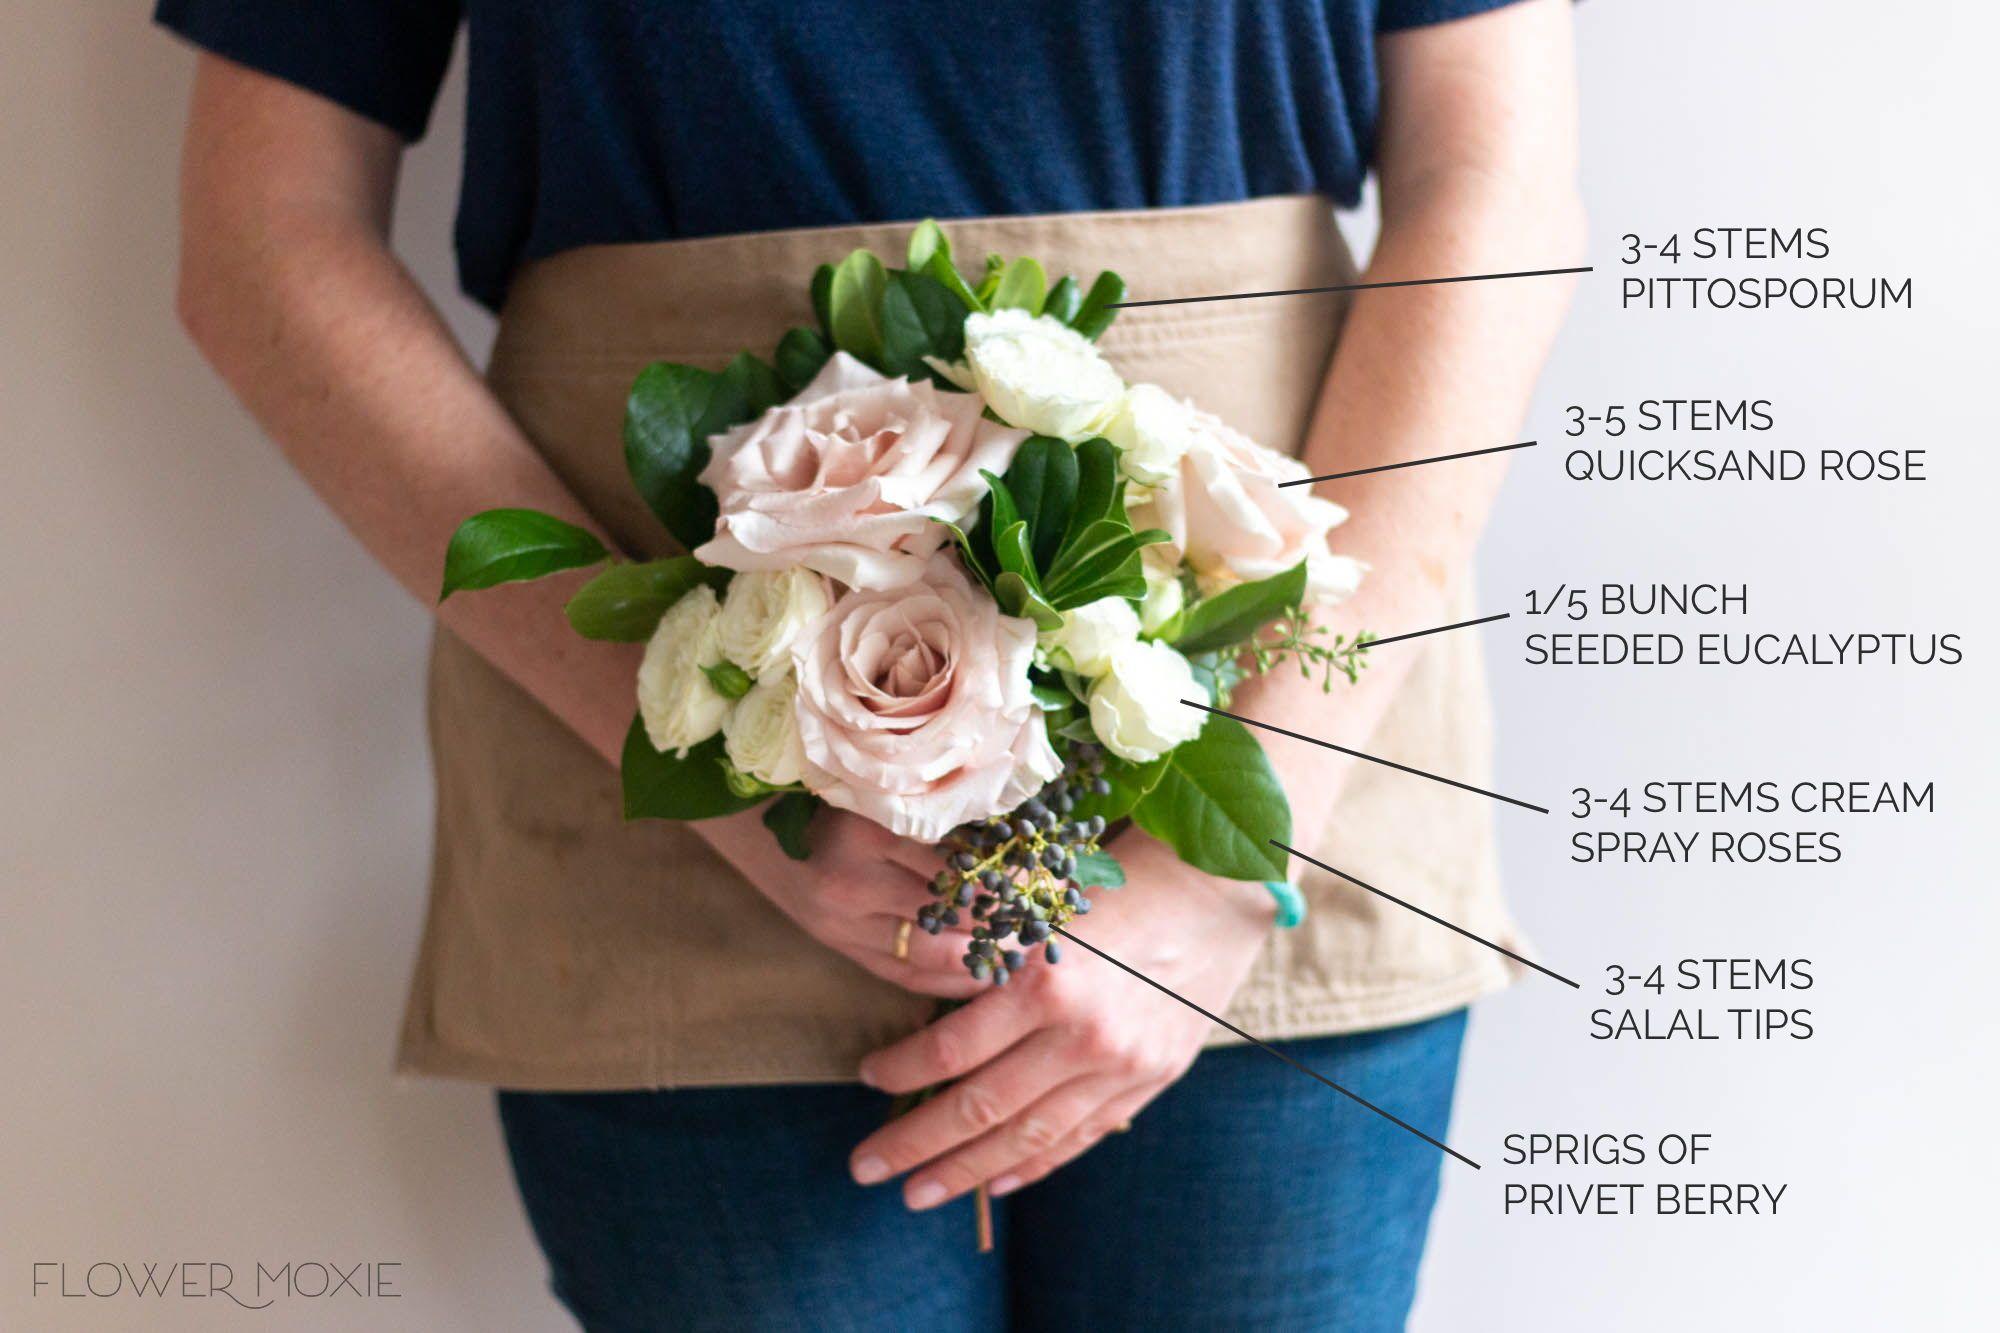 Flowermoxie Bulk Wedding Flowers Online Fresh Flowers For Weddings Bulk Wedding Flowers Online Wedding Flowers Wedding Flower Packages